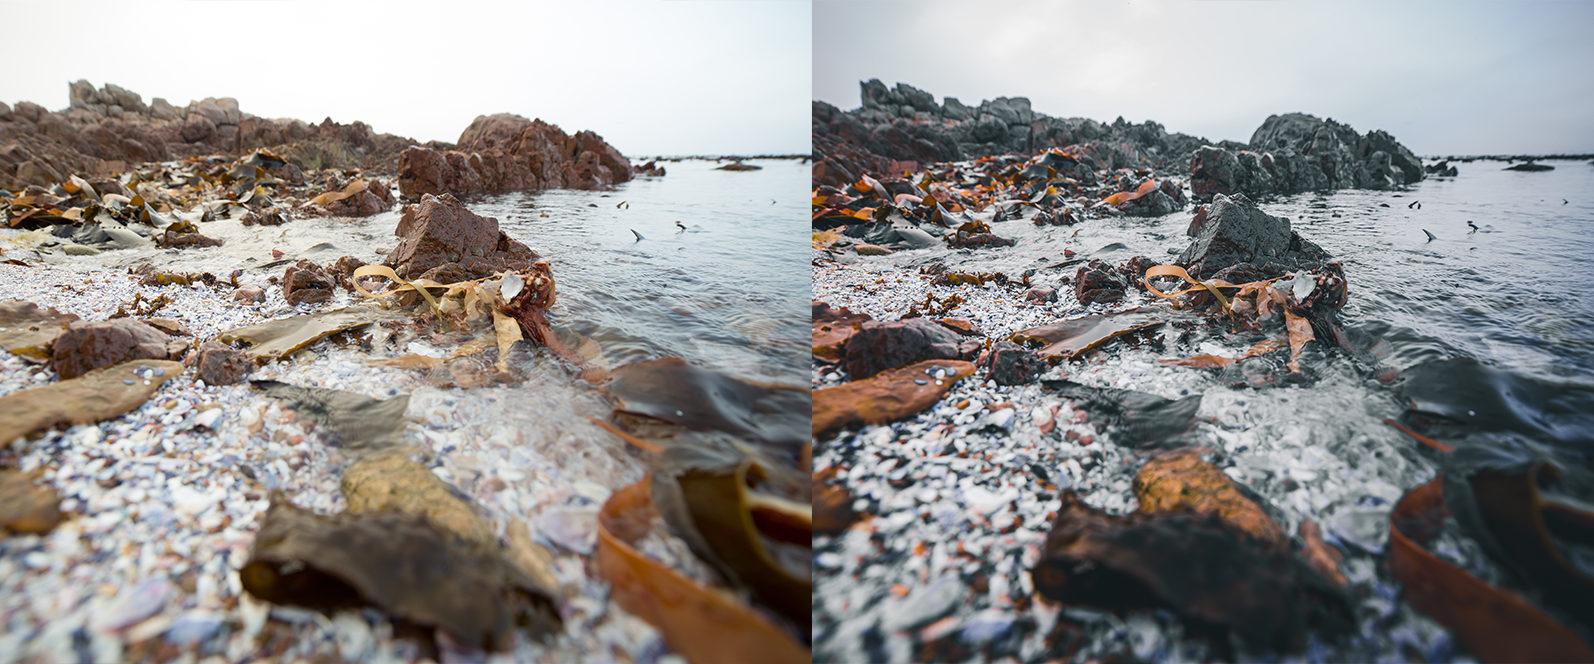 12 x Lightroom Presets, Cape Columbine, Beach and Ocean Presets, Seascape Presets - 11 Cape Columbine1 -